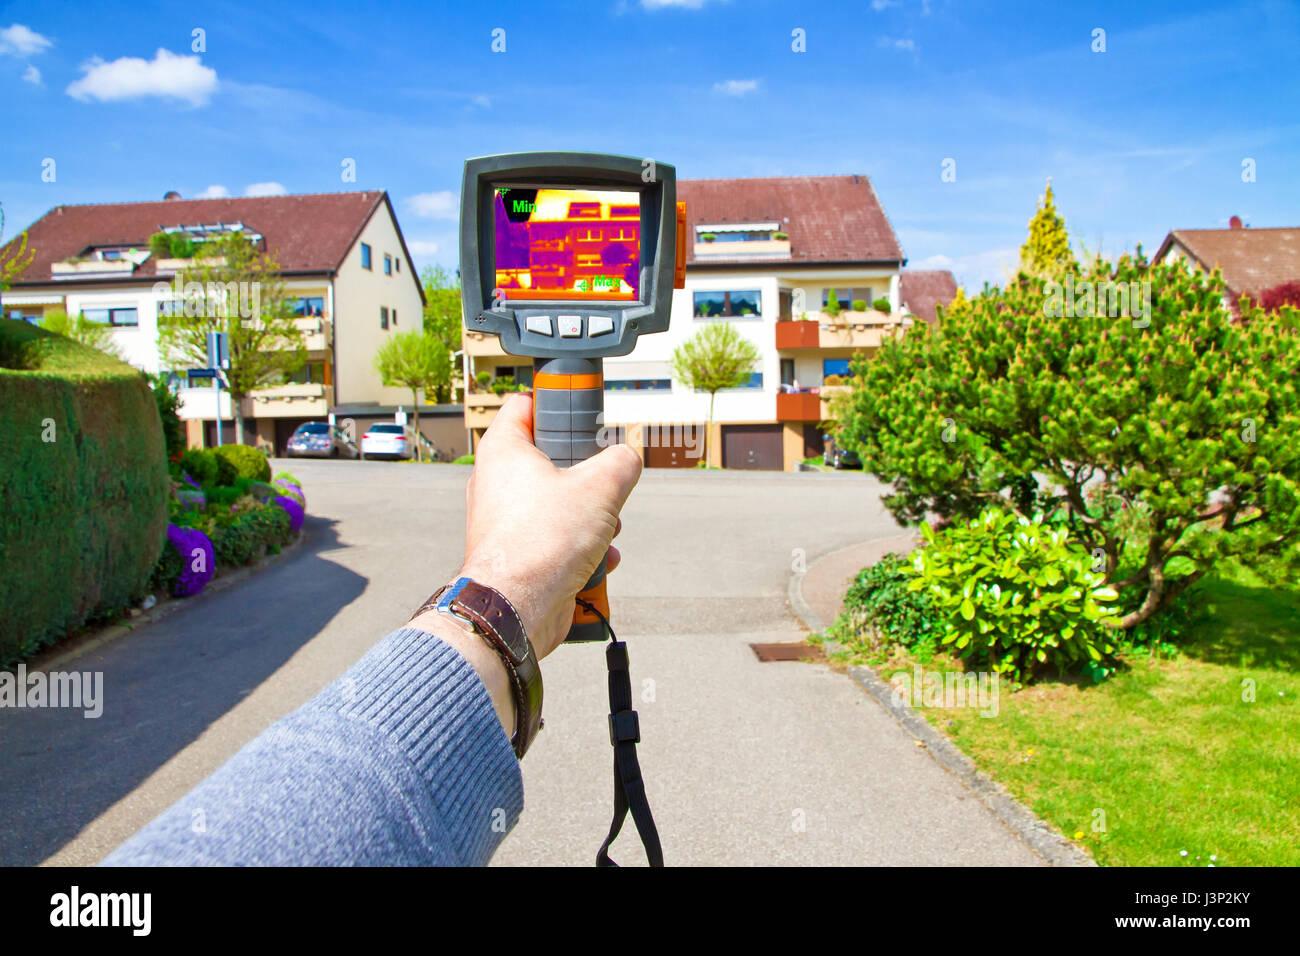 Homme avec caméra infrarouge Photo Stock